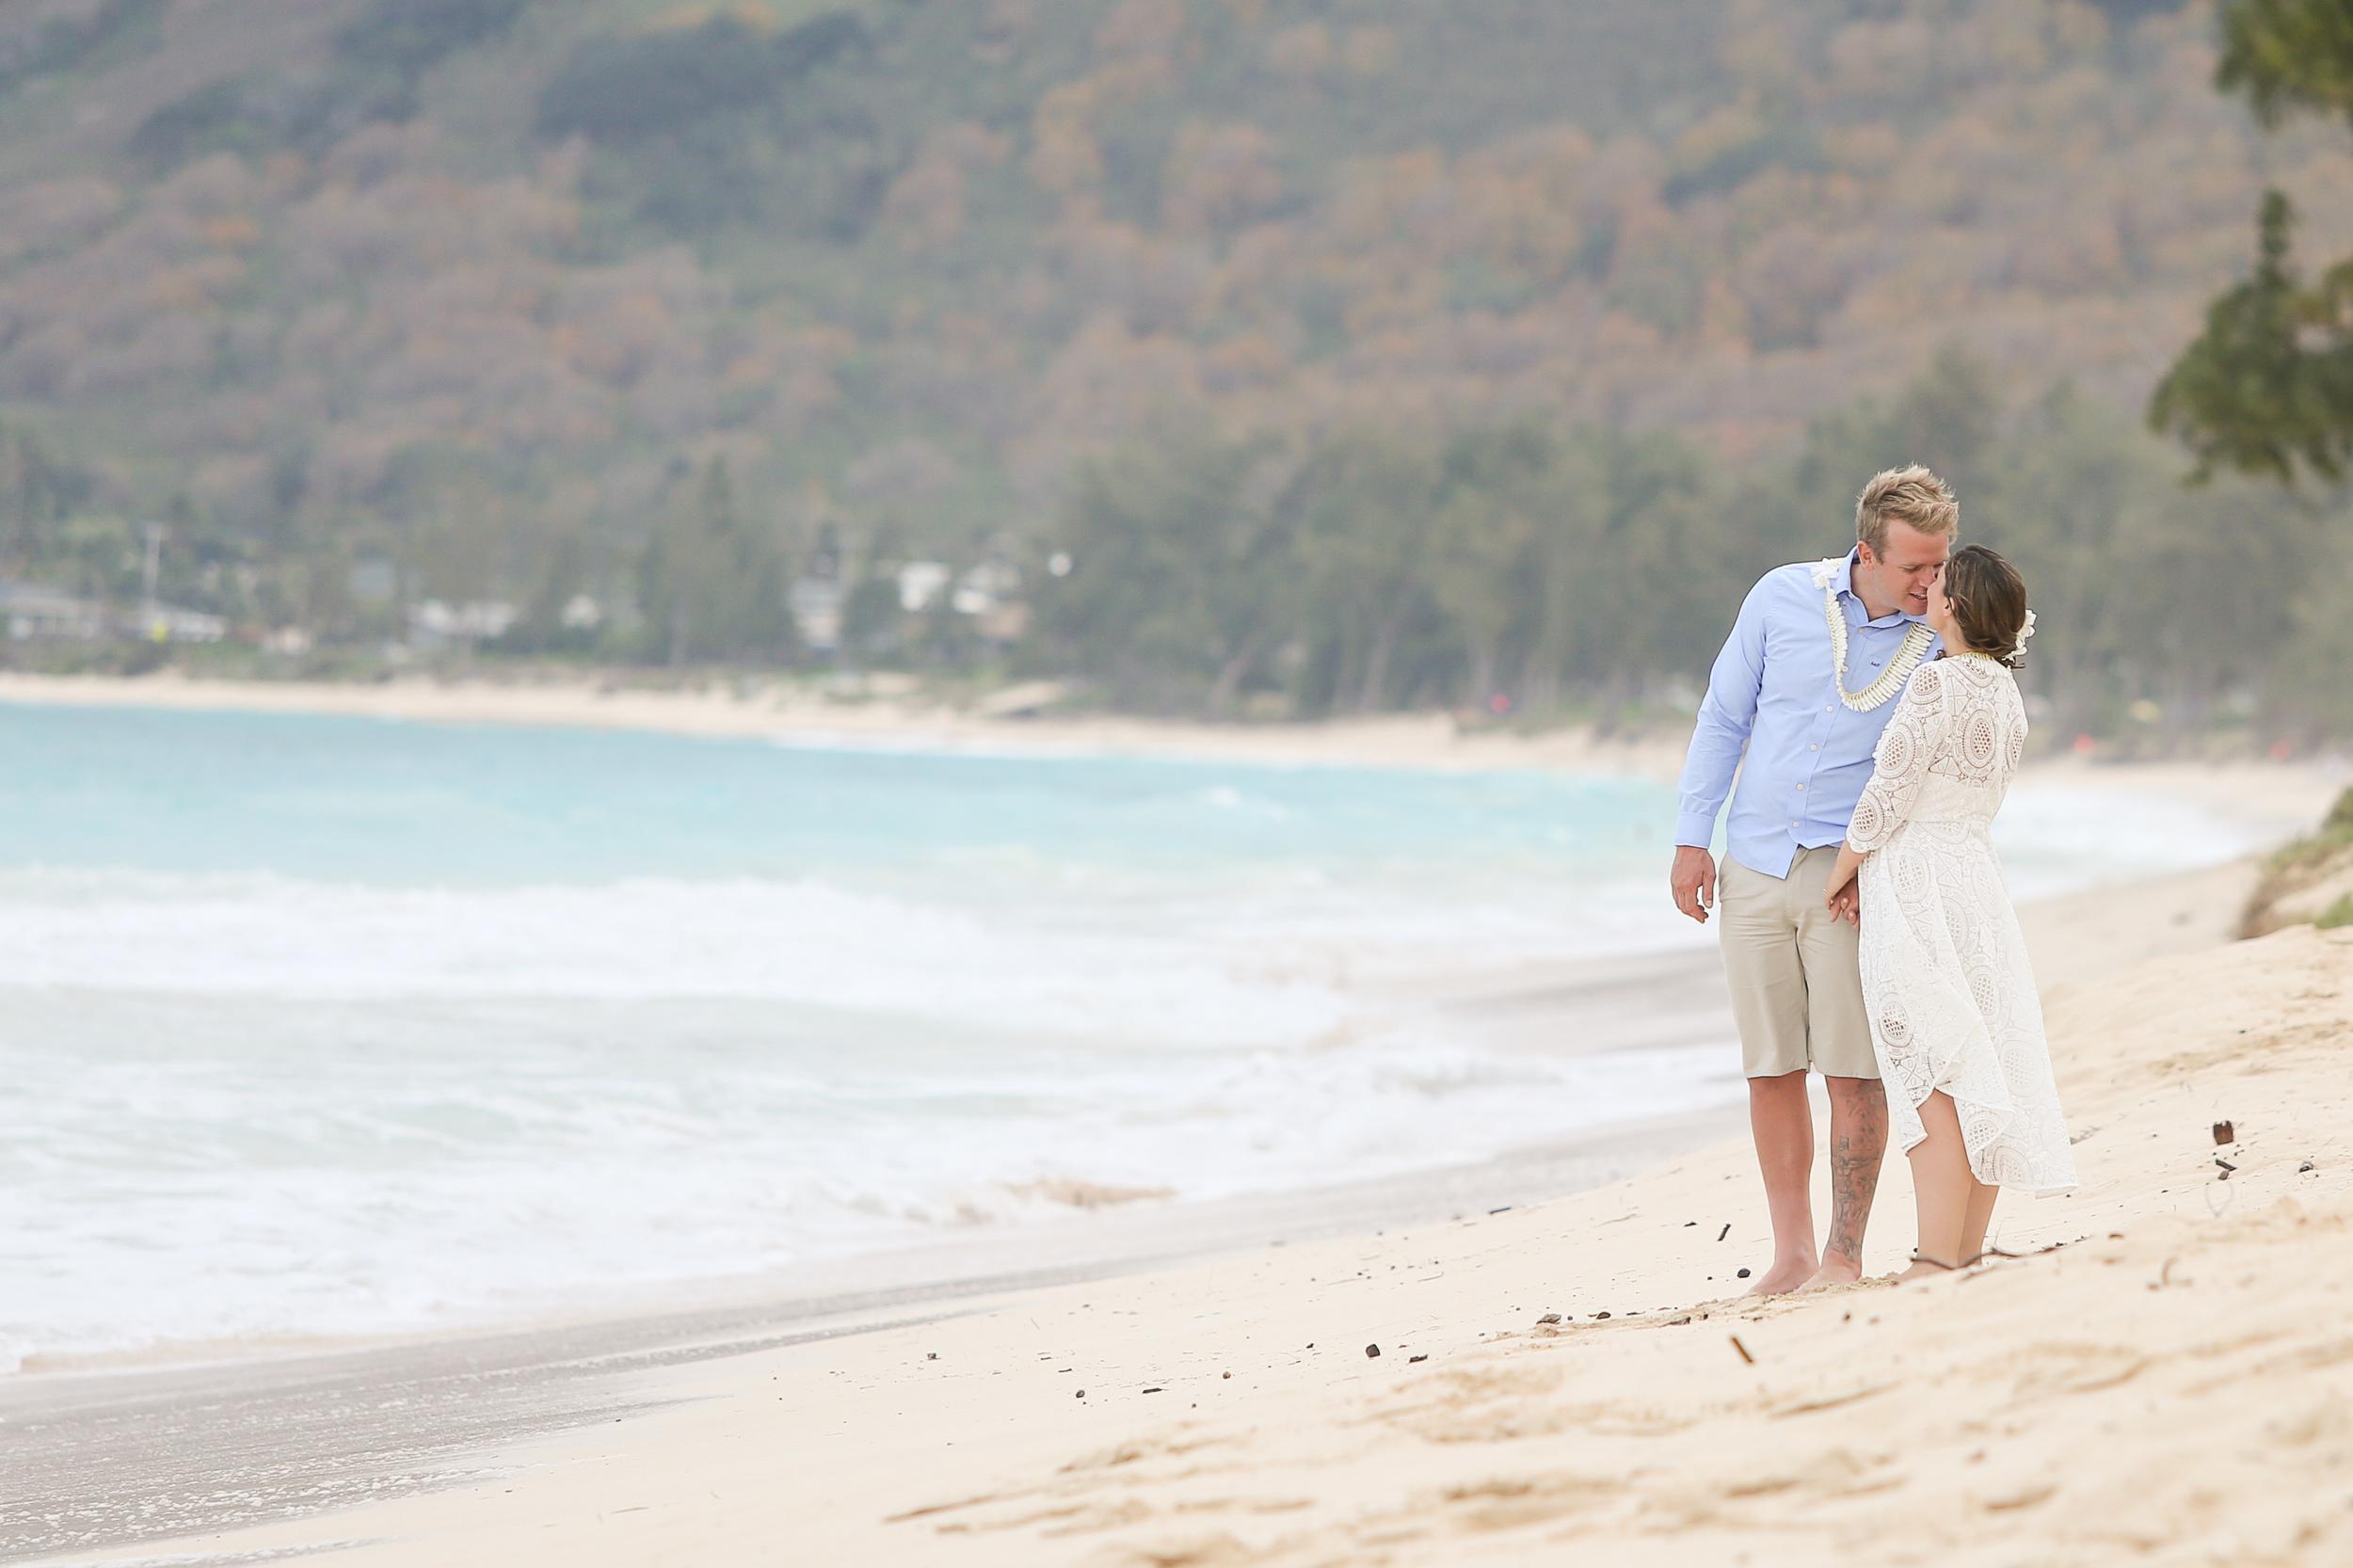 Tracey and Evan Wedding 2015_011.JPG